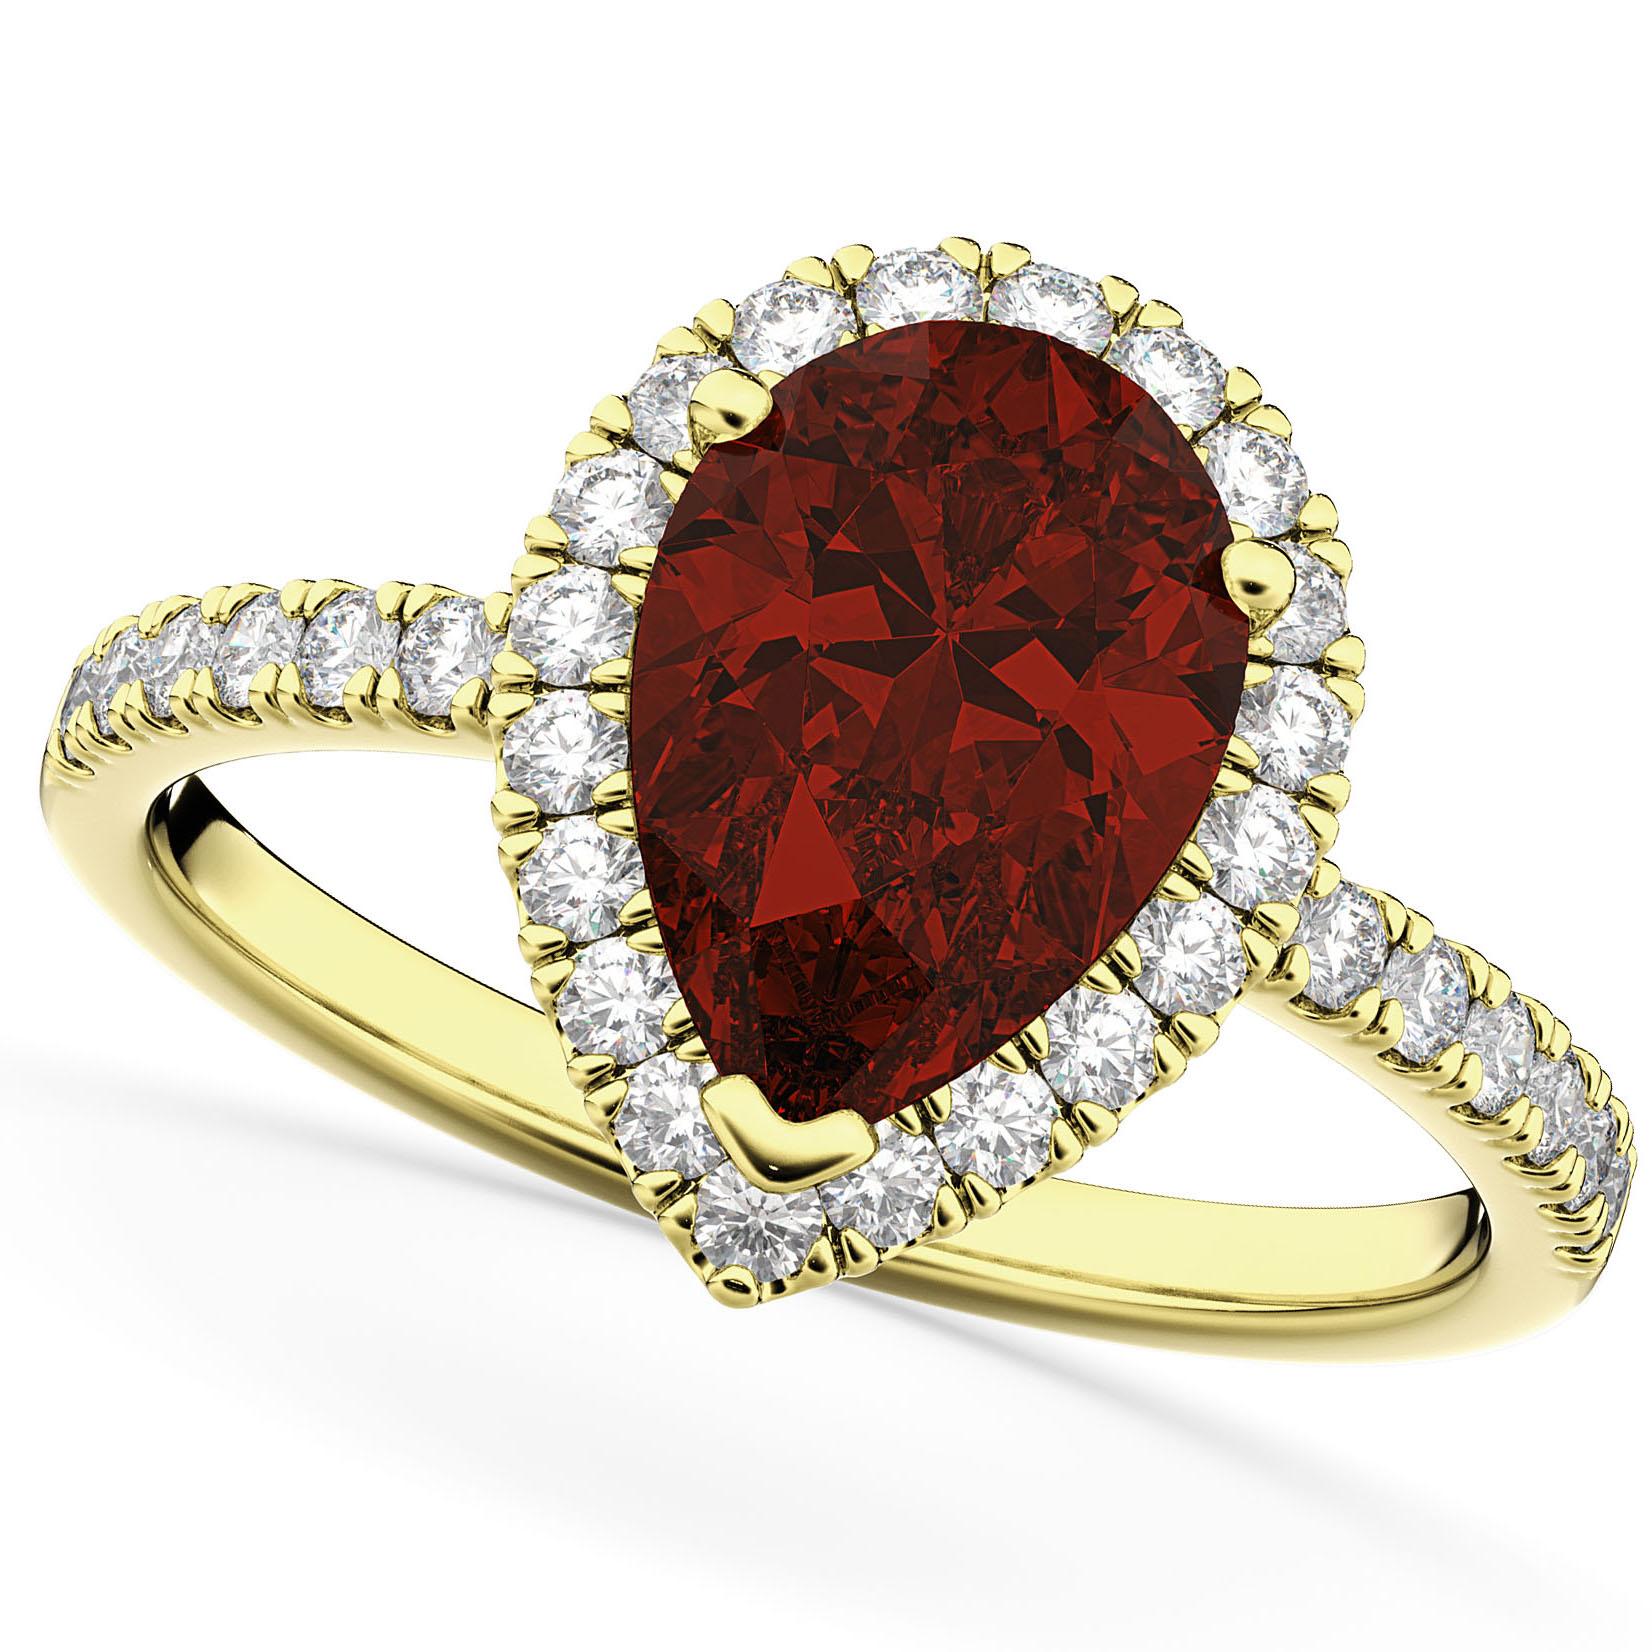 Pear Cut Halo Garnet & Diamond Engagement Ring 14K Yellow Gold 2.31ct